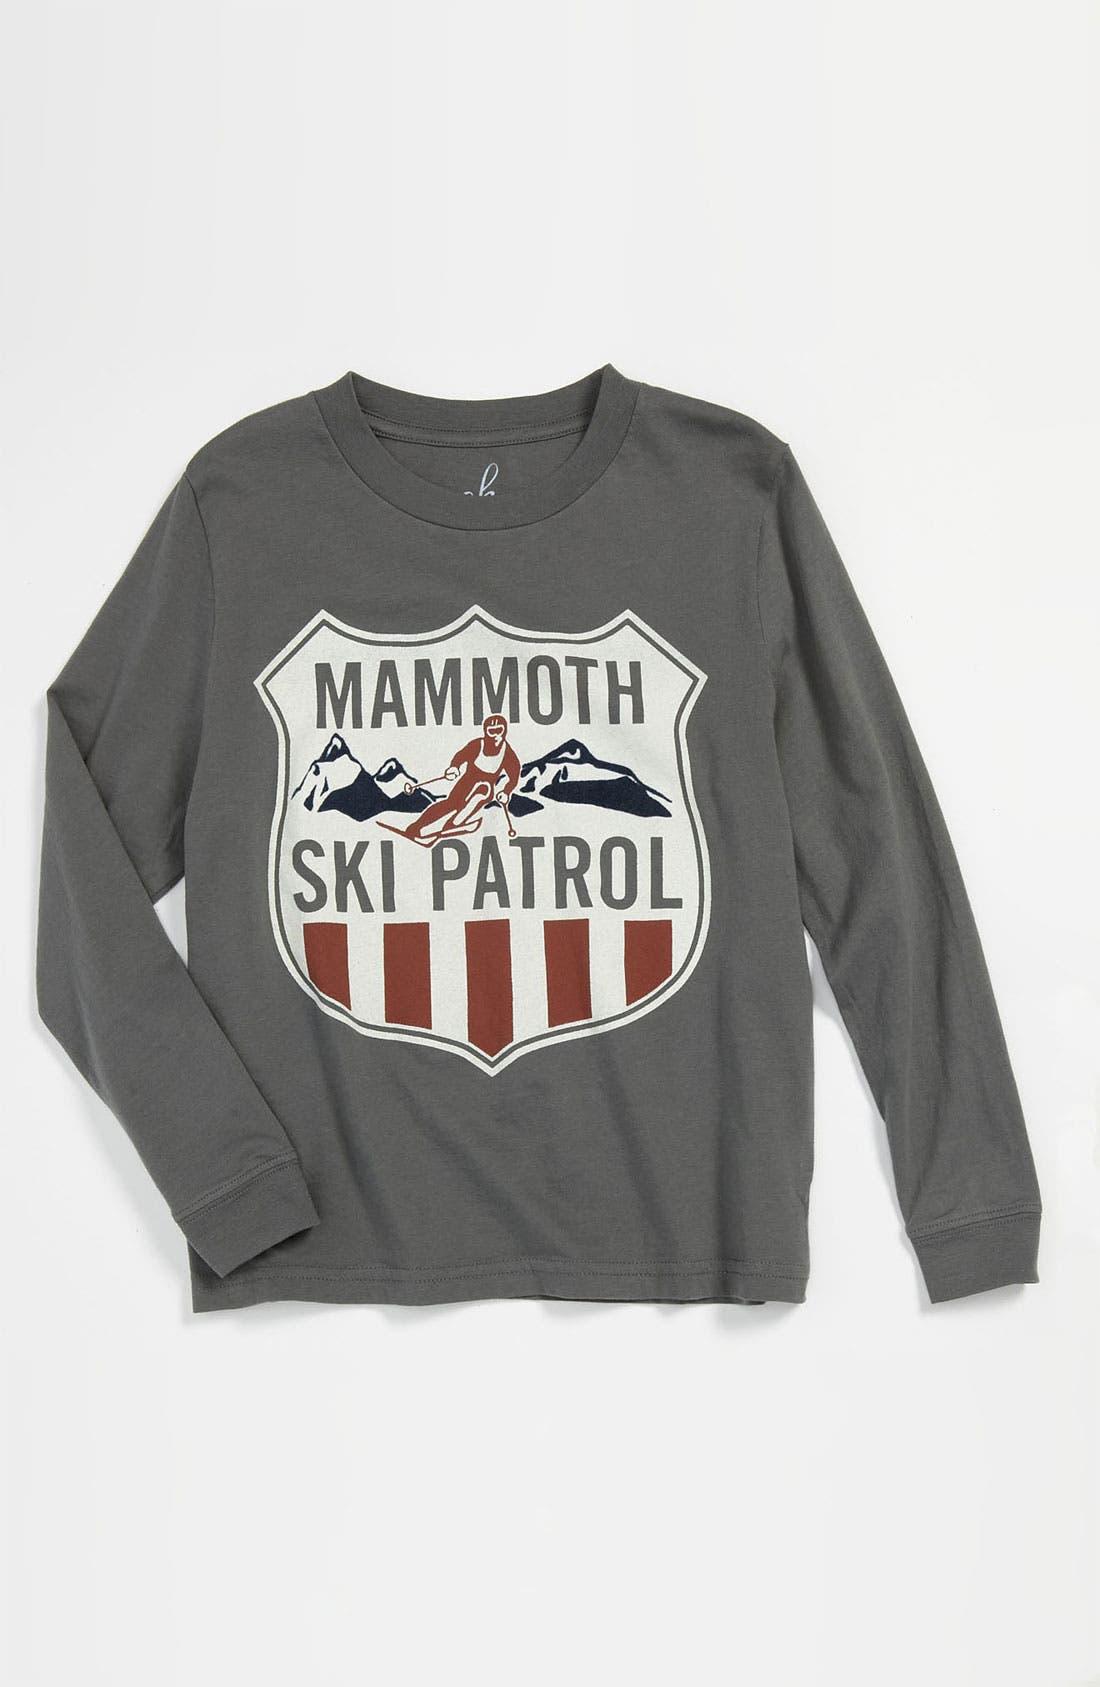 Alternate Image 1 Selected - Peek 'Mammoth Ski Patrol' T-Shirt (Toddler, Little Boys & Big Boys)